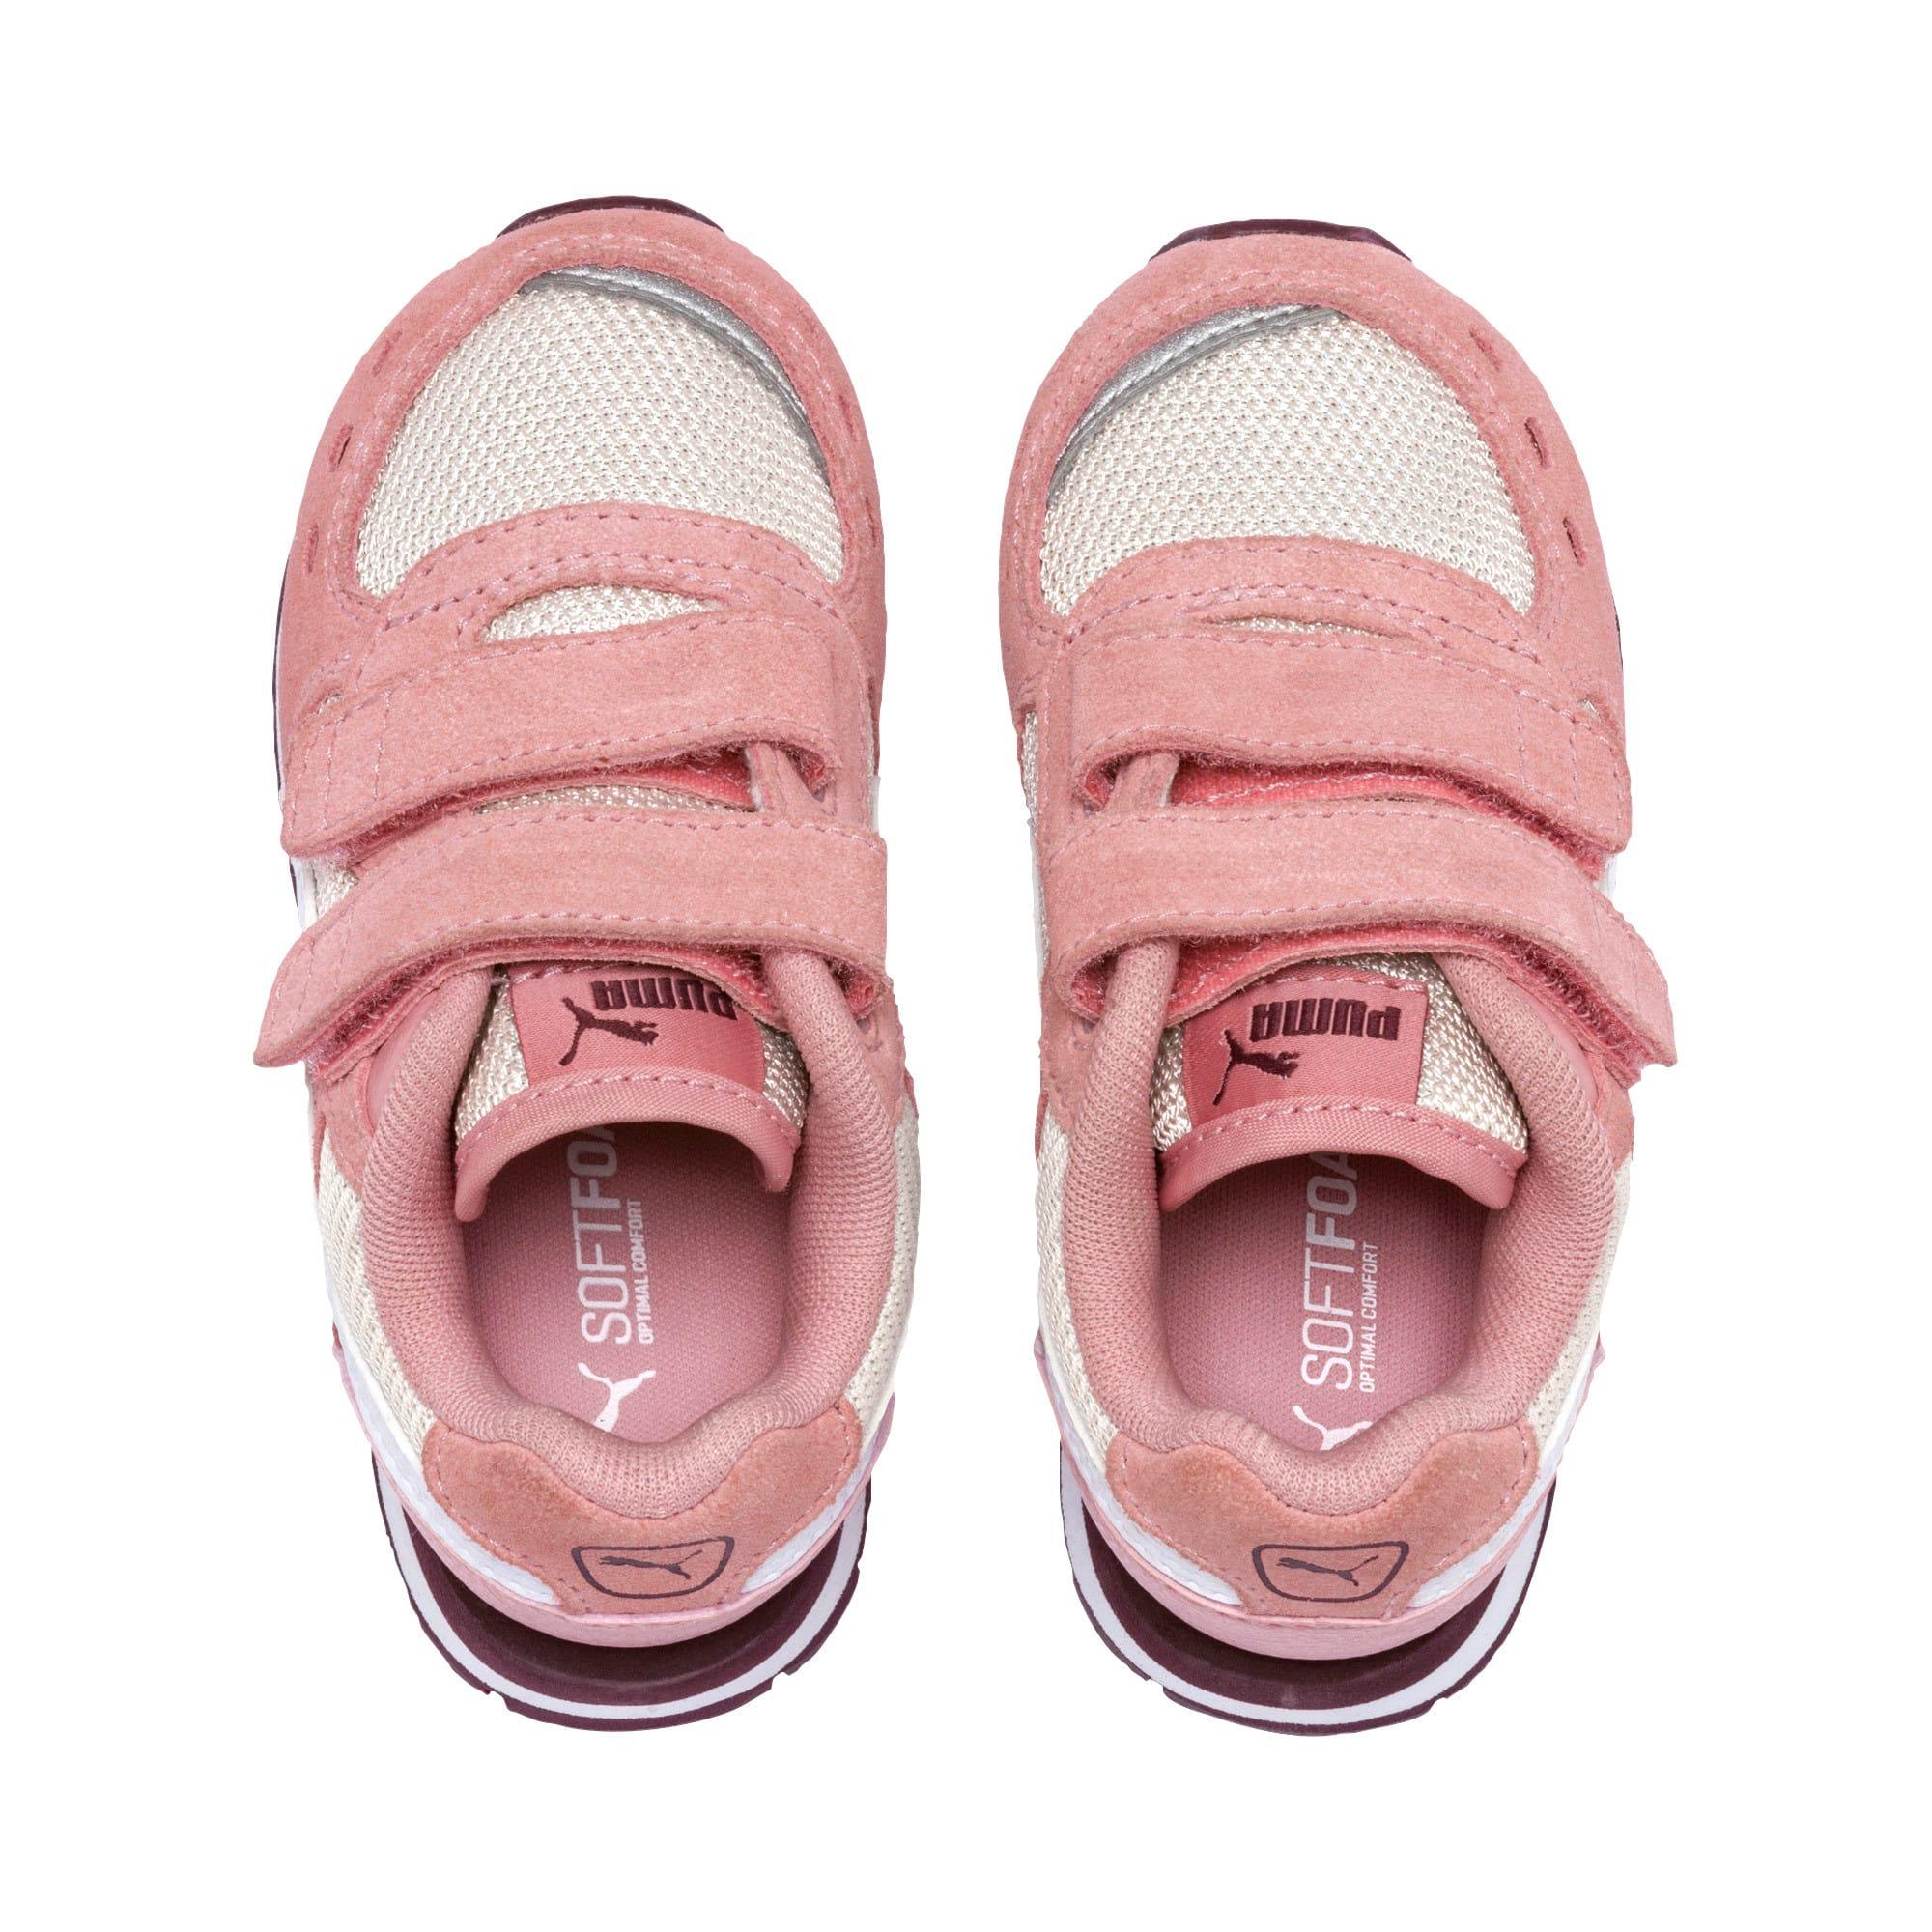 Thumbnail 6 of Vista V Babies Sneaker, Bridal Rose-Puma White, medium